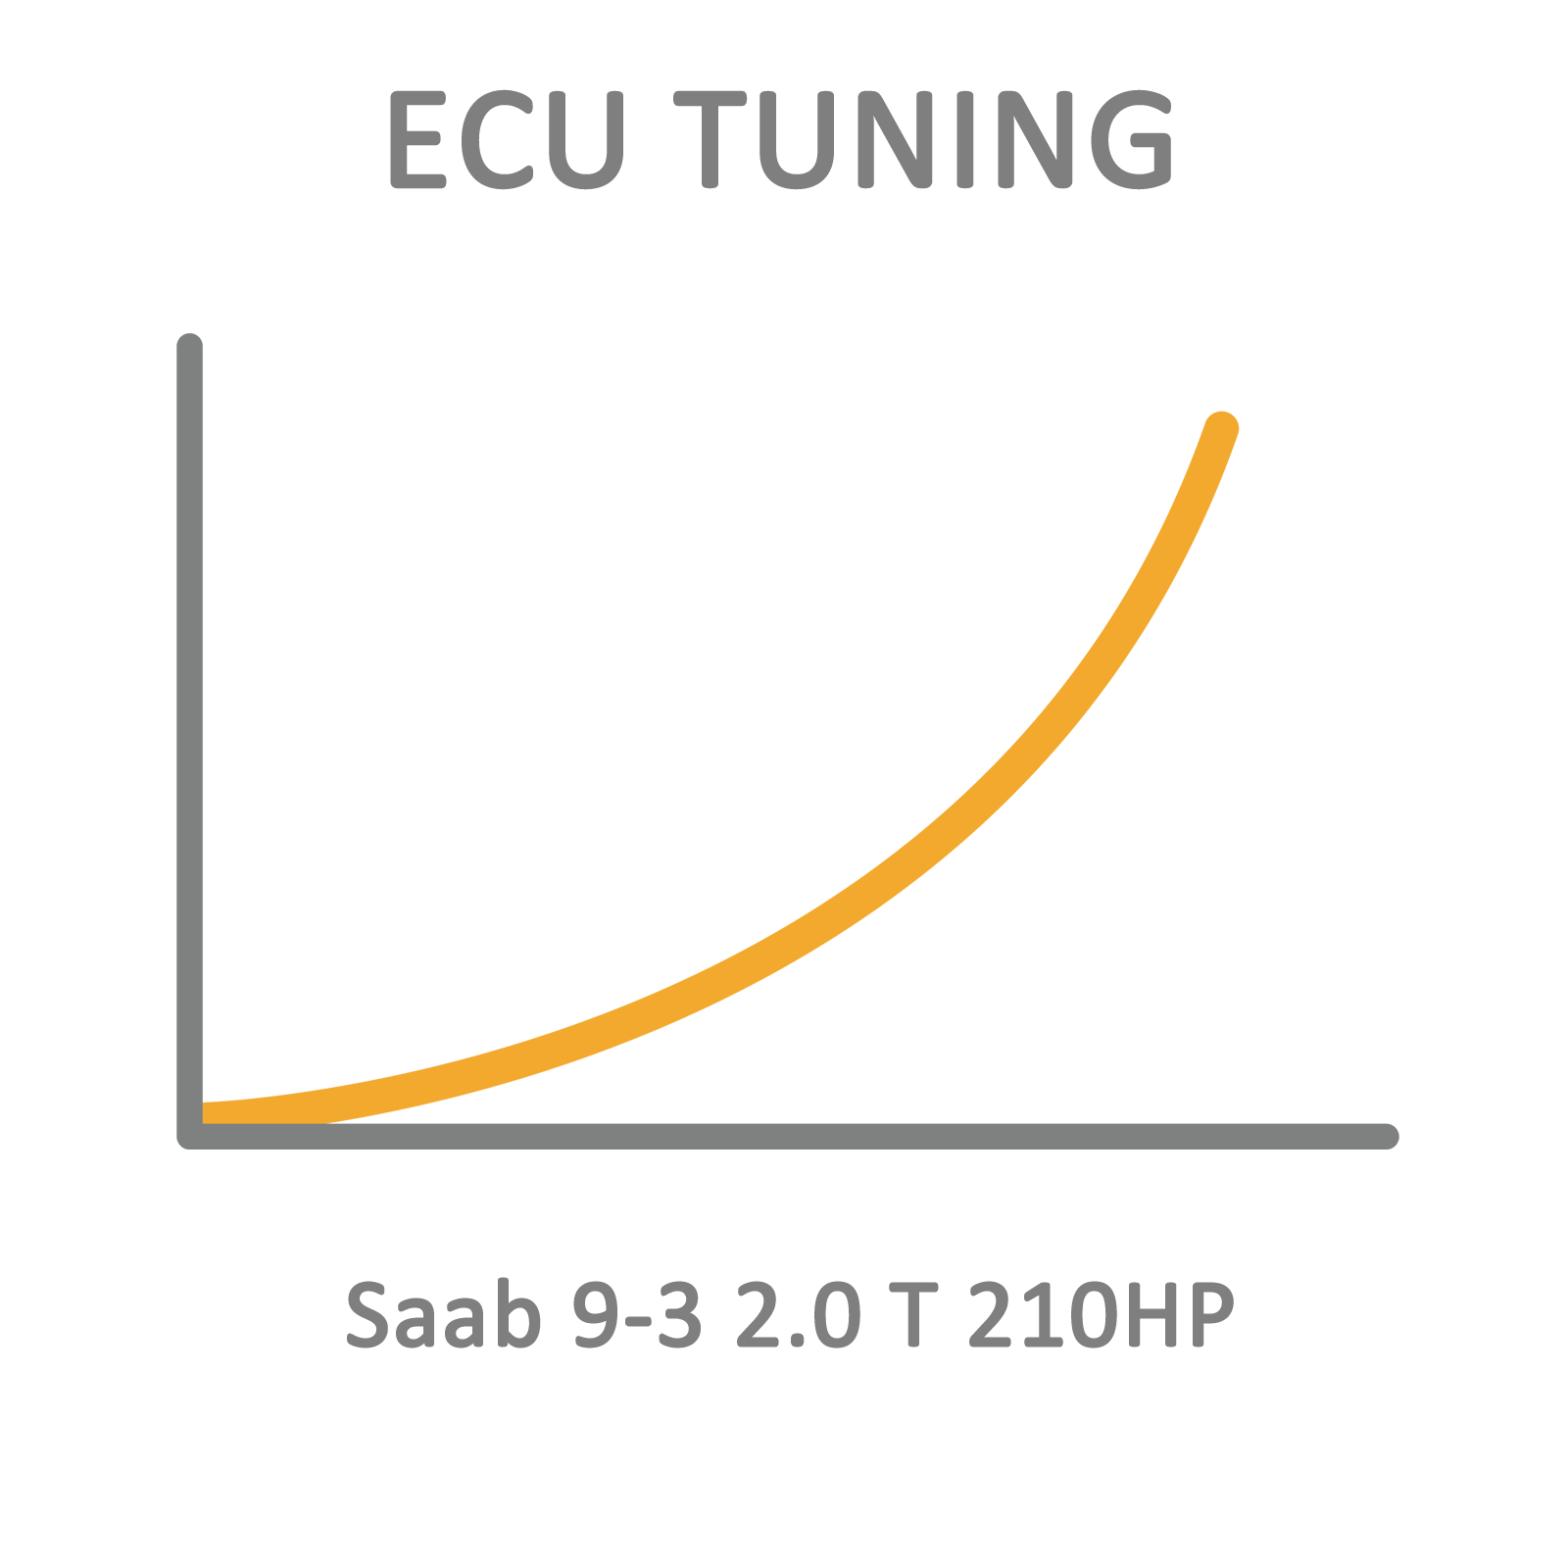 Saab 9-3 2.0 T 210HP ECU Tuning Remapping Programming